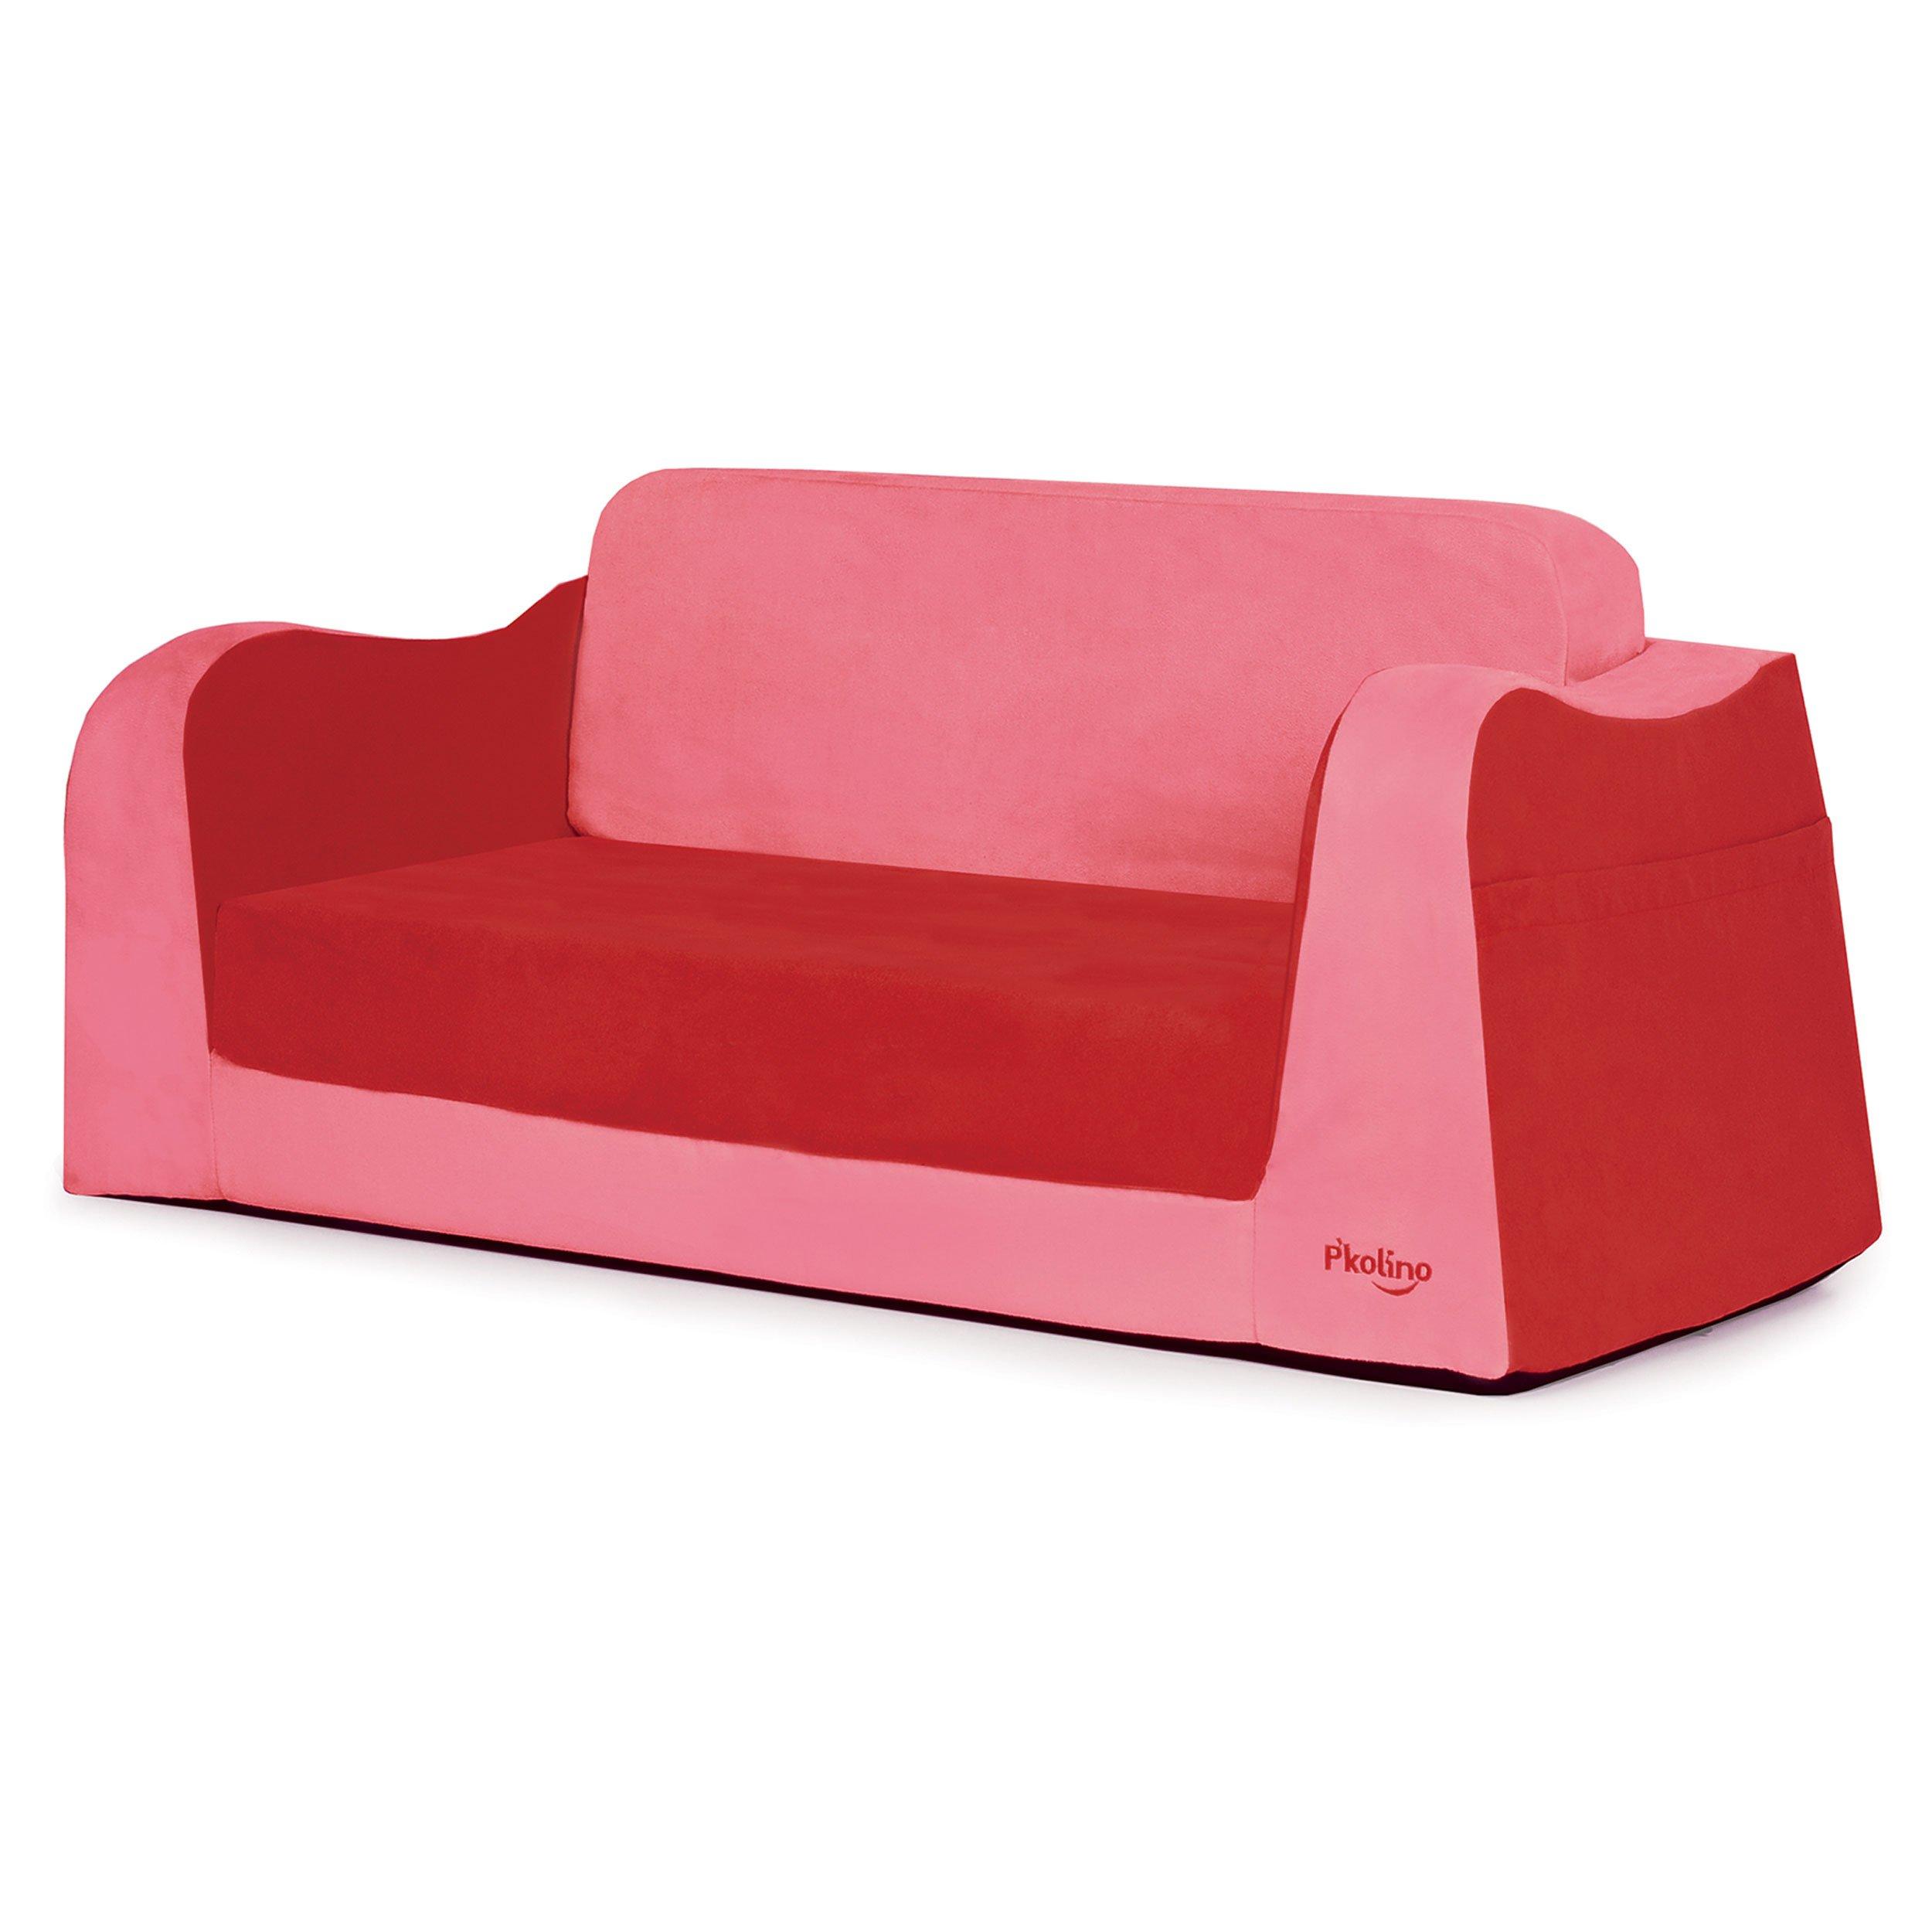 P'kolino Little Sofa / Sleeper - Red